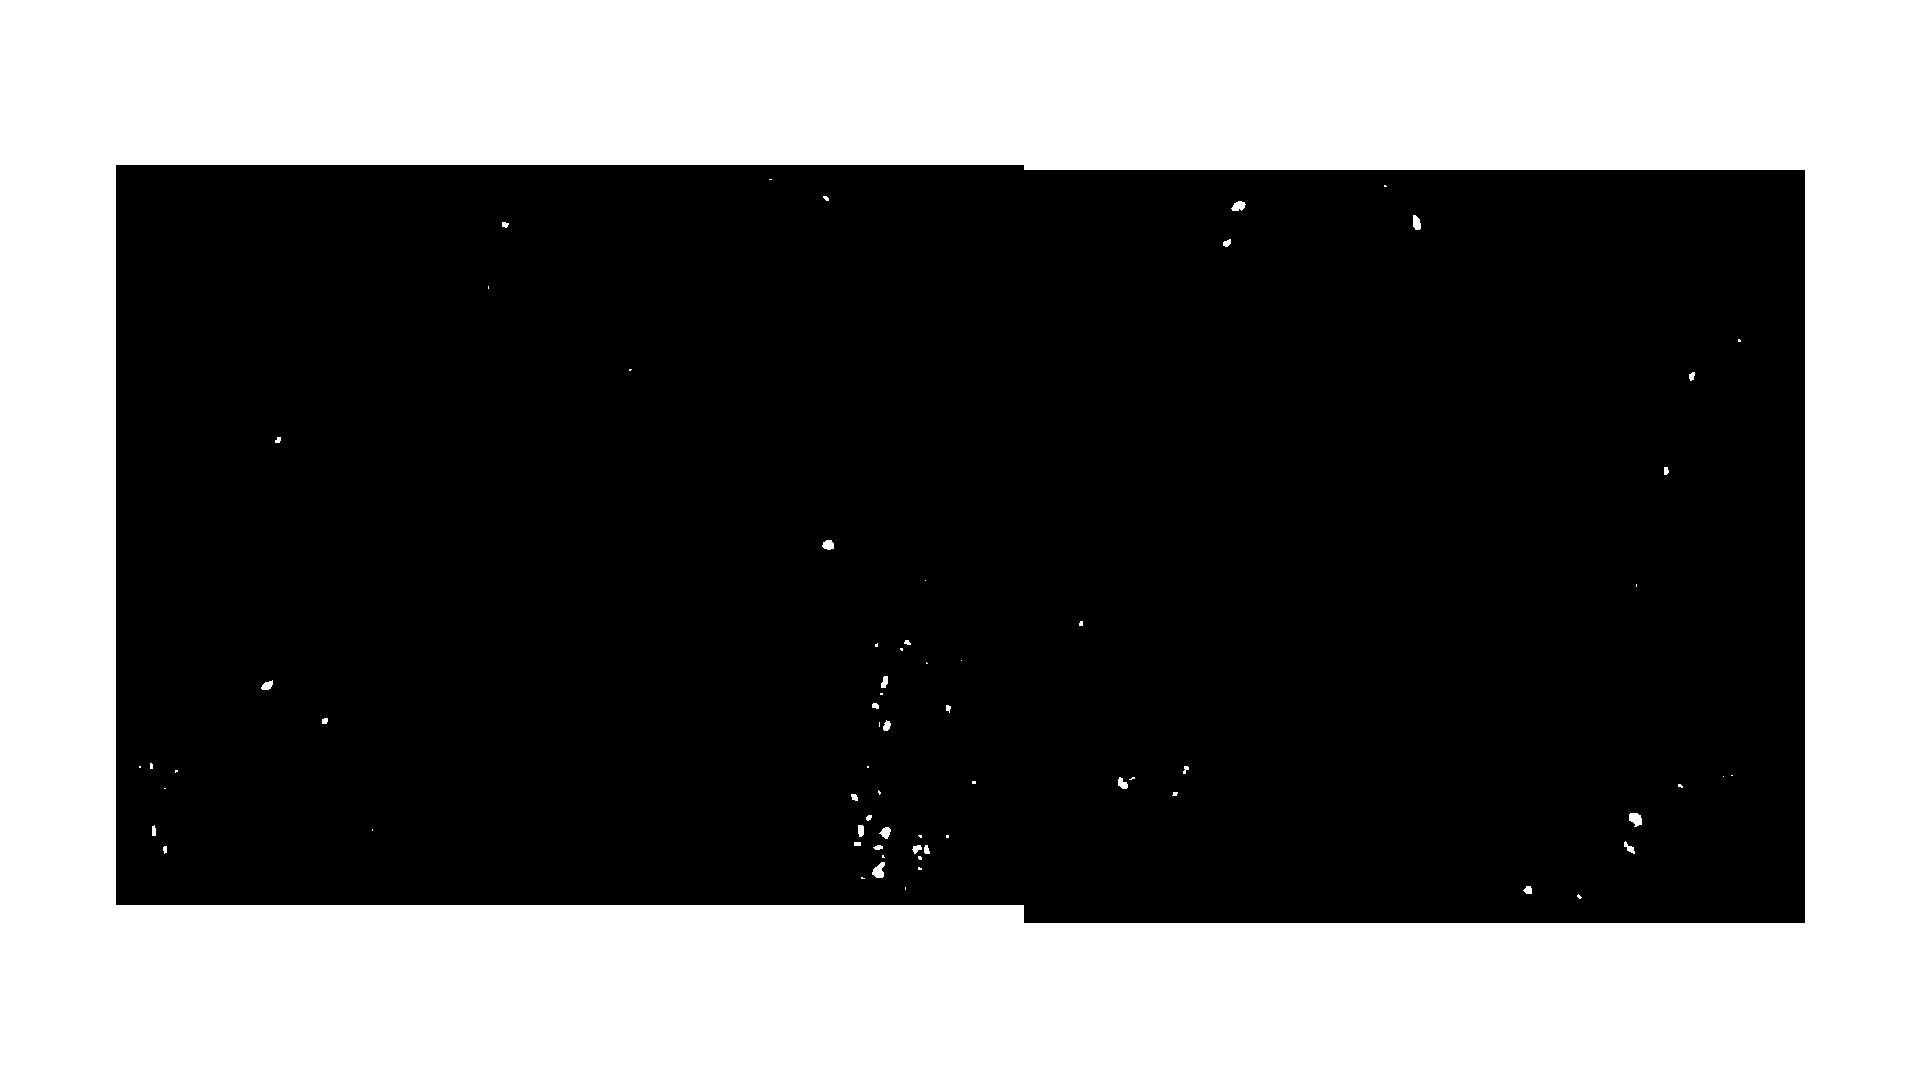 Zombie MMO мечты - Изображение 2